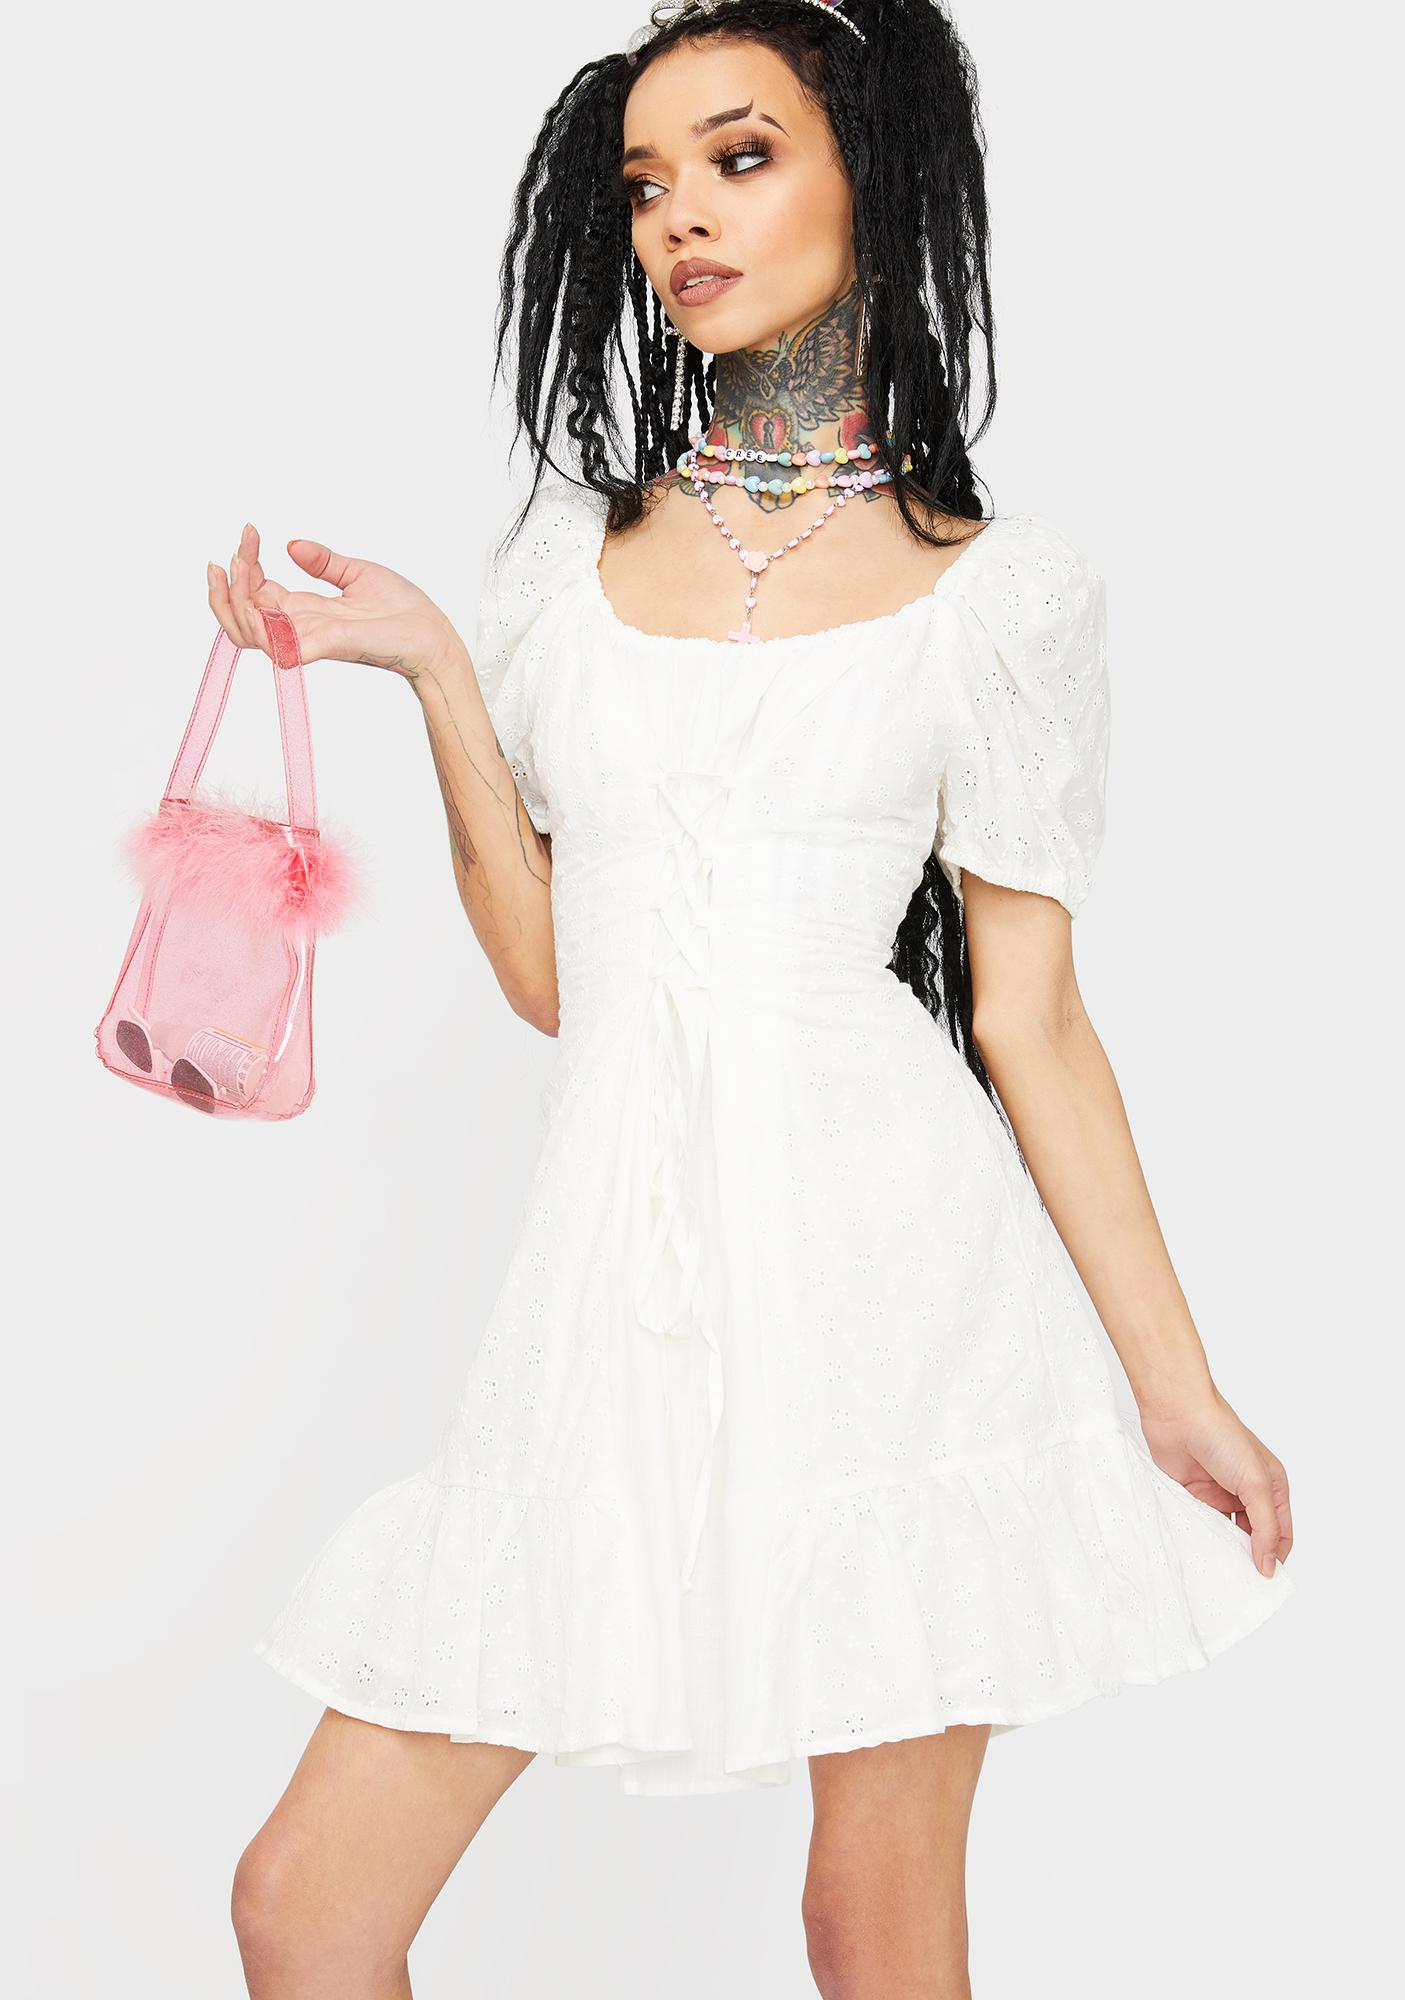 Soft Girl Szn Mini Dress